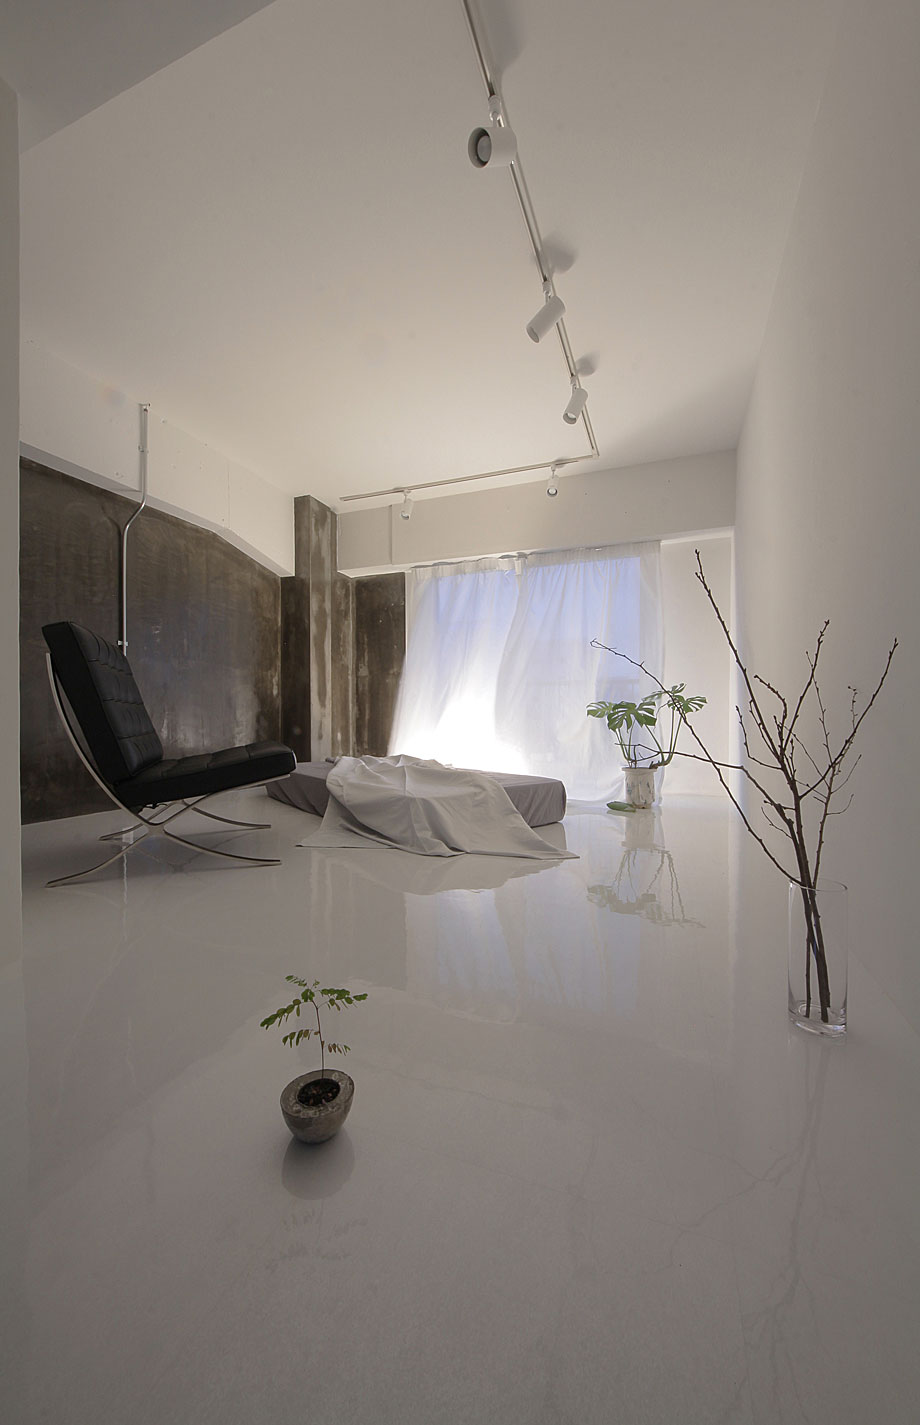 apartamento-osaka-japon-jun-murata-1